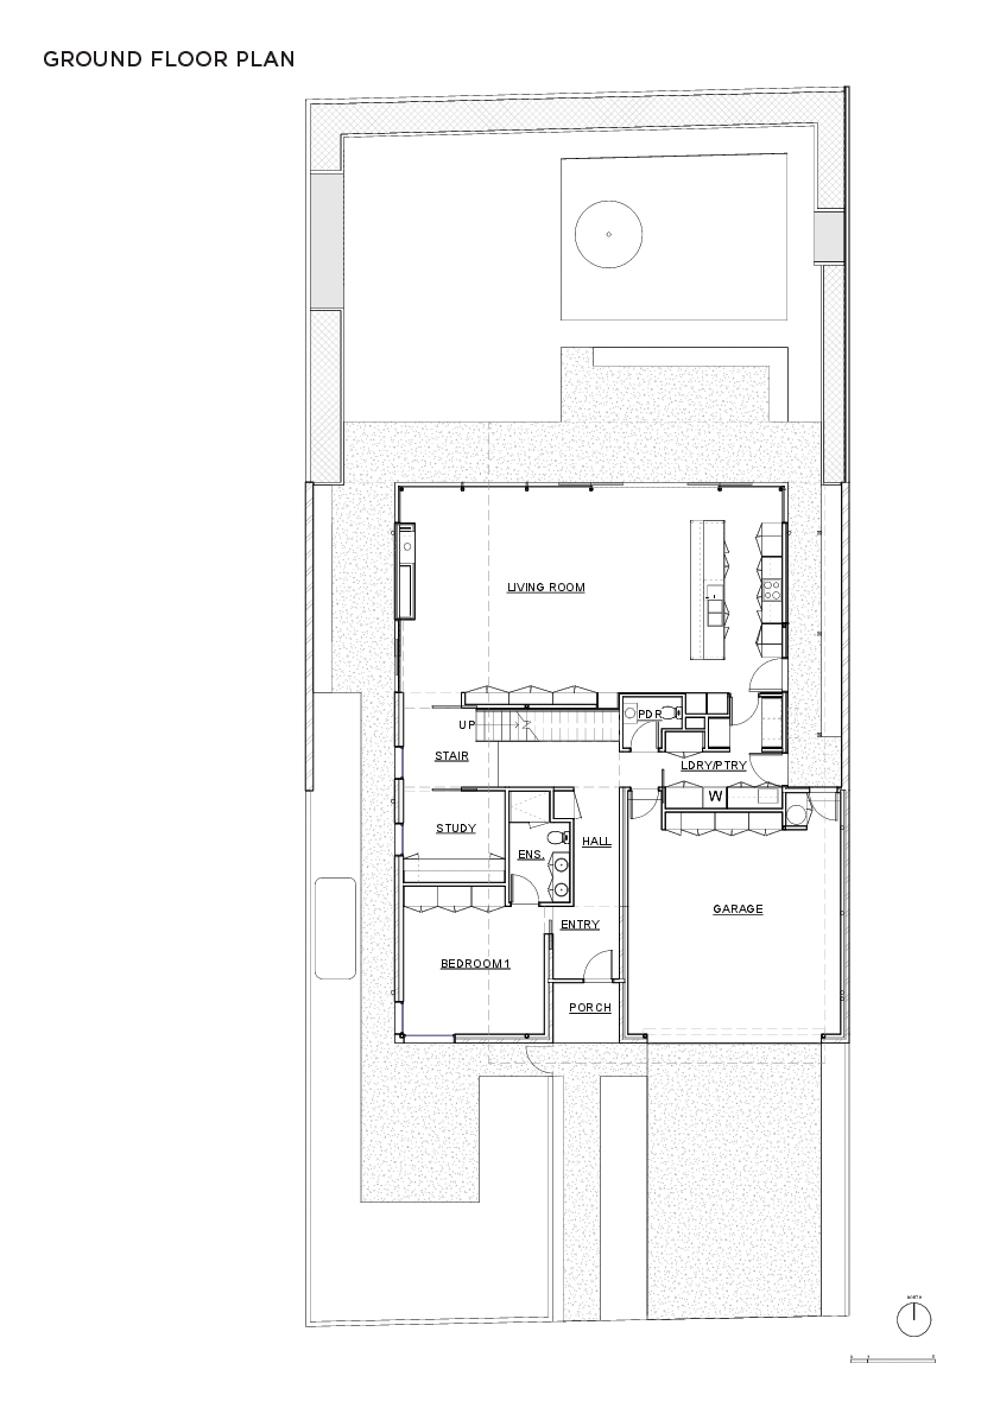 ford-street-house-chaulk-studio-the-design-emotive-02-2.jpg